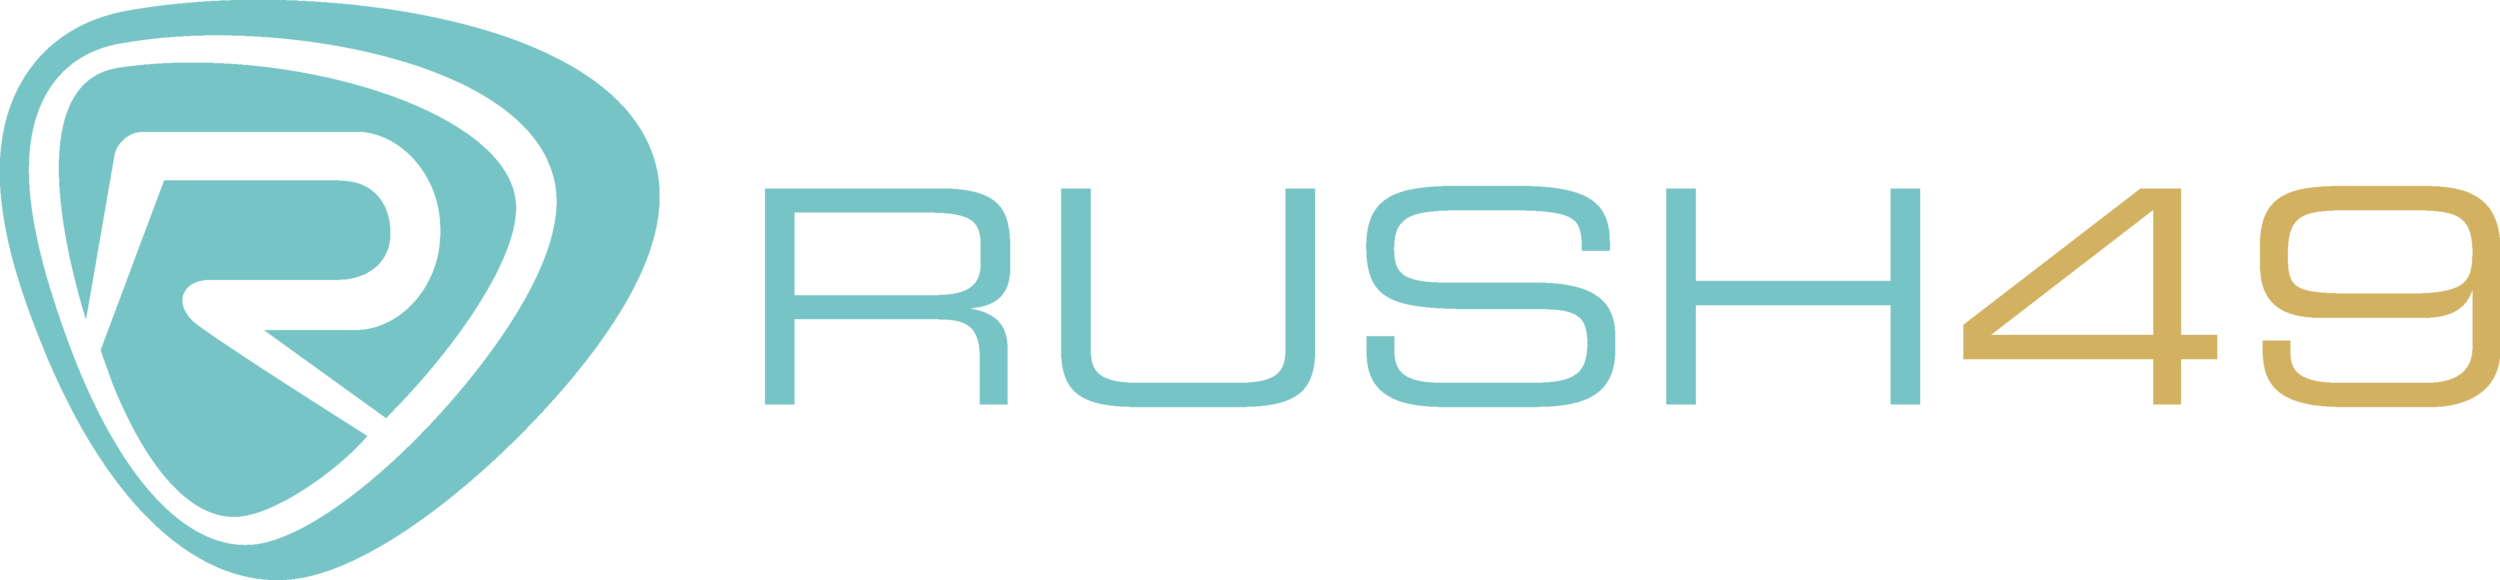 rush49.png